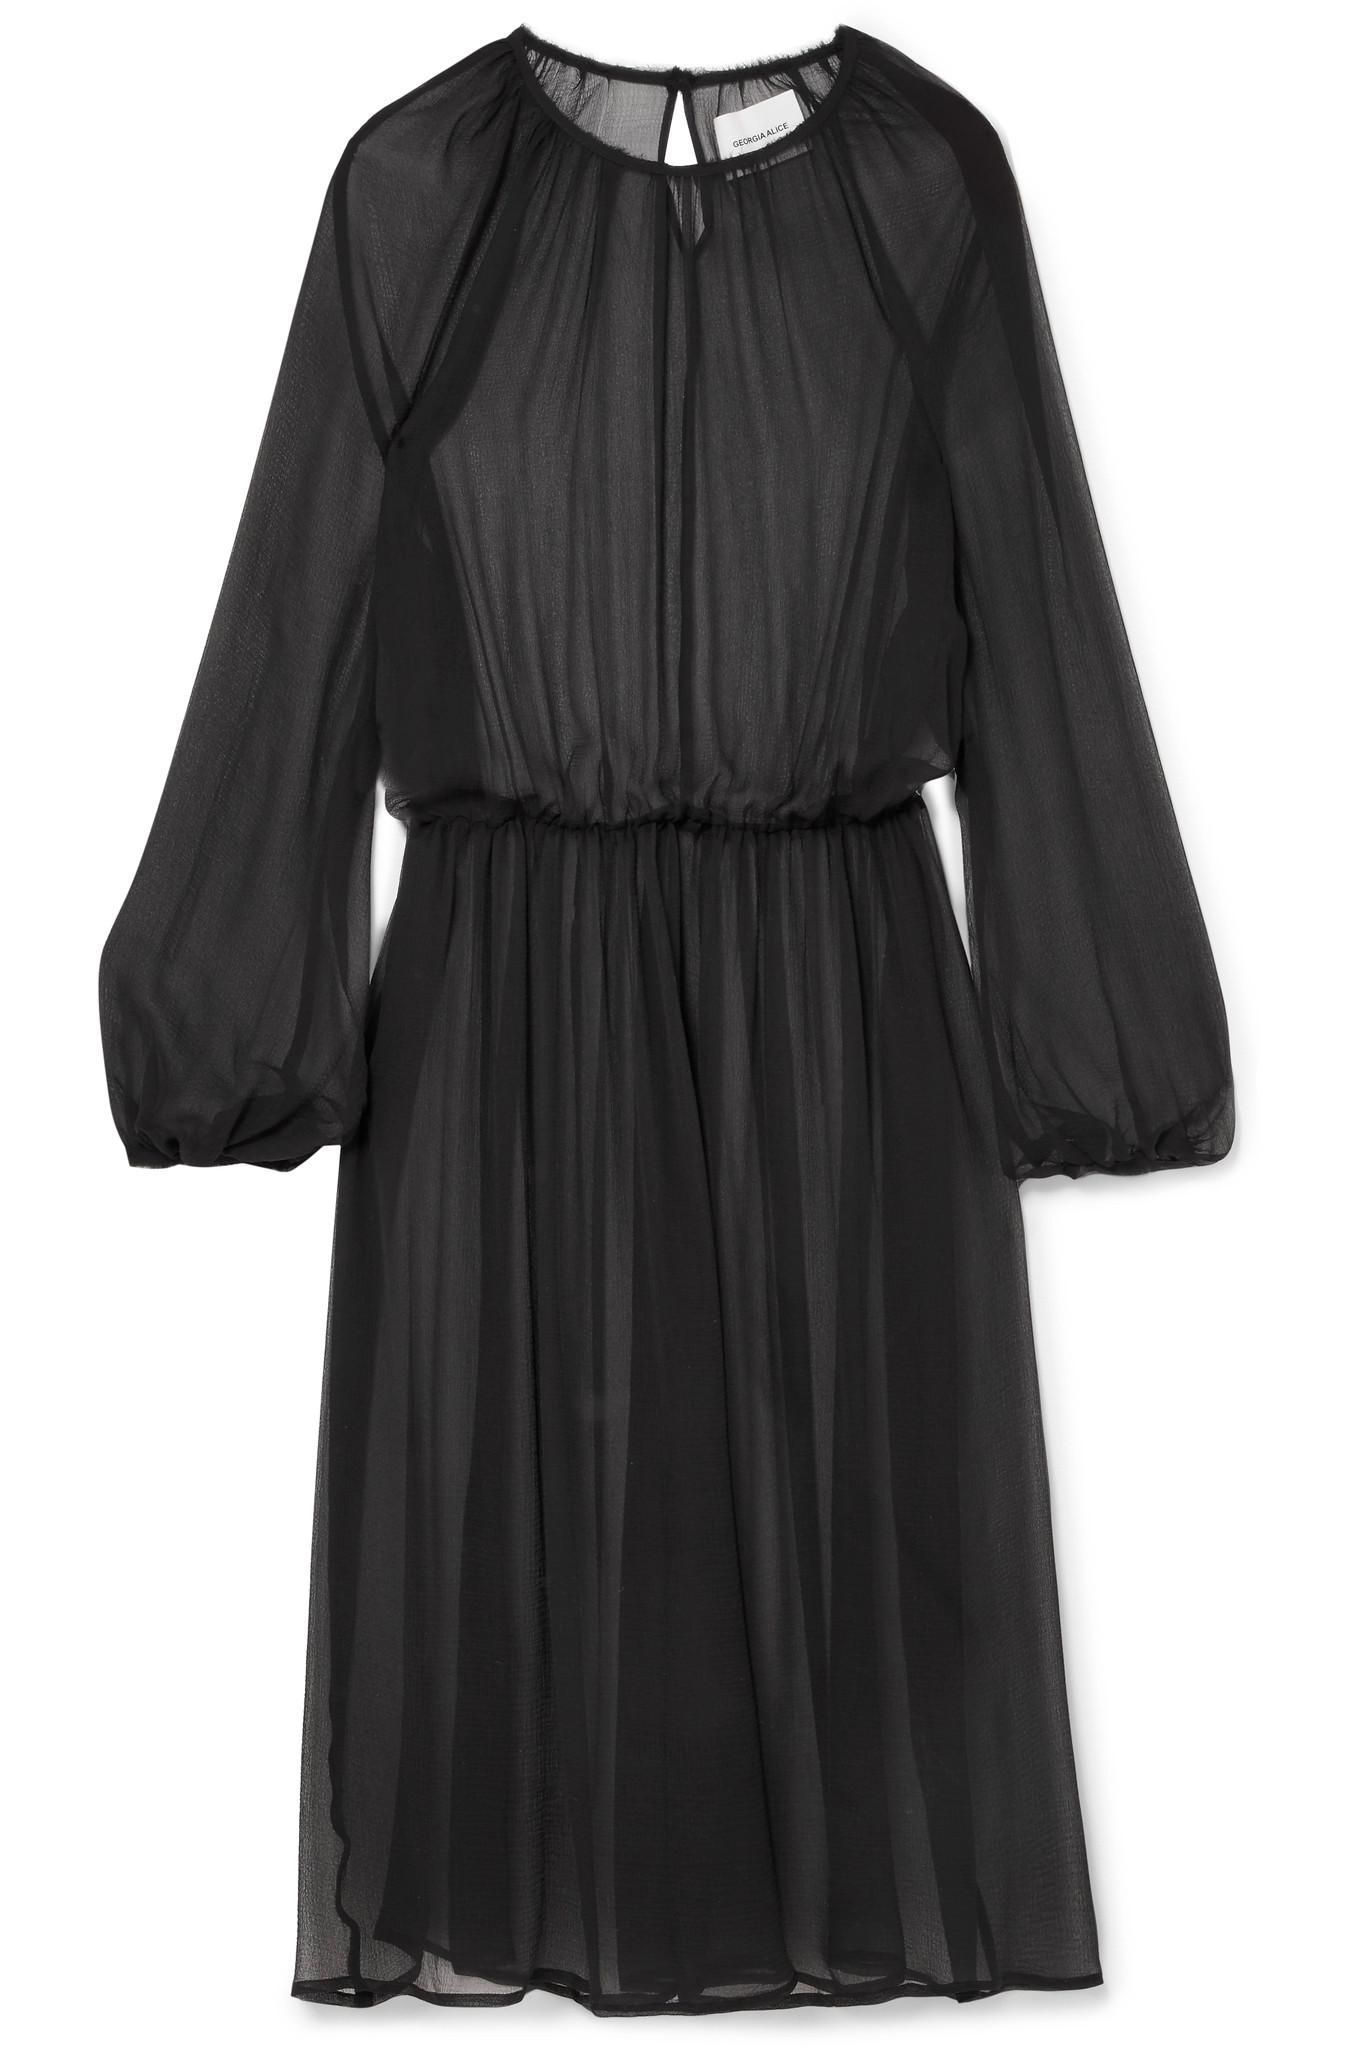 New Angel Silk-chiffon Midi Dress - Black Georgia Alice 0d1OMNBHSf